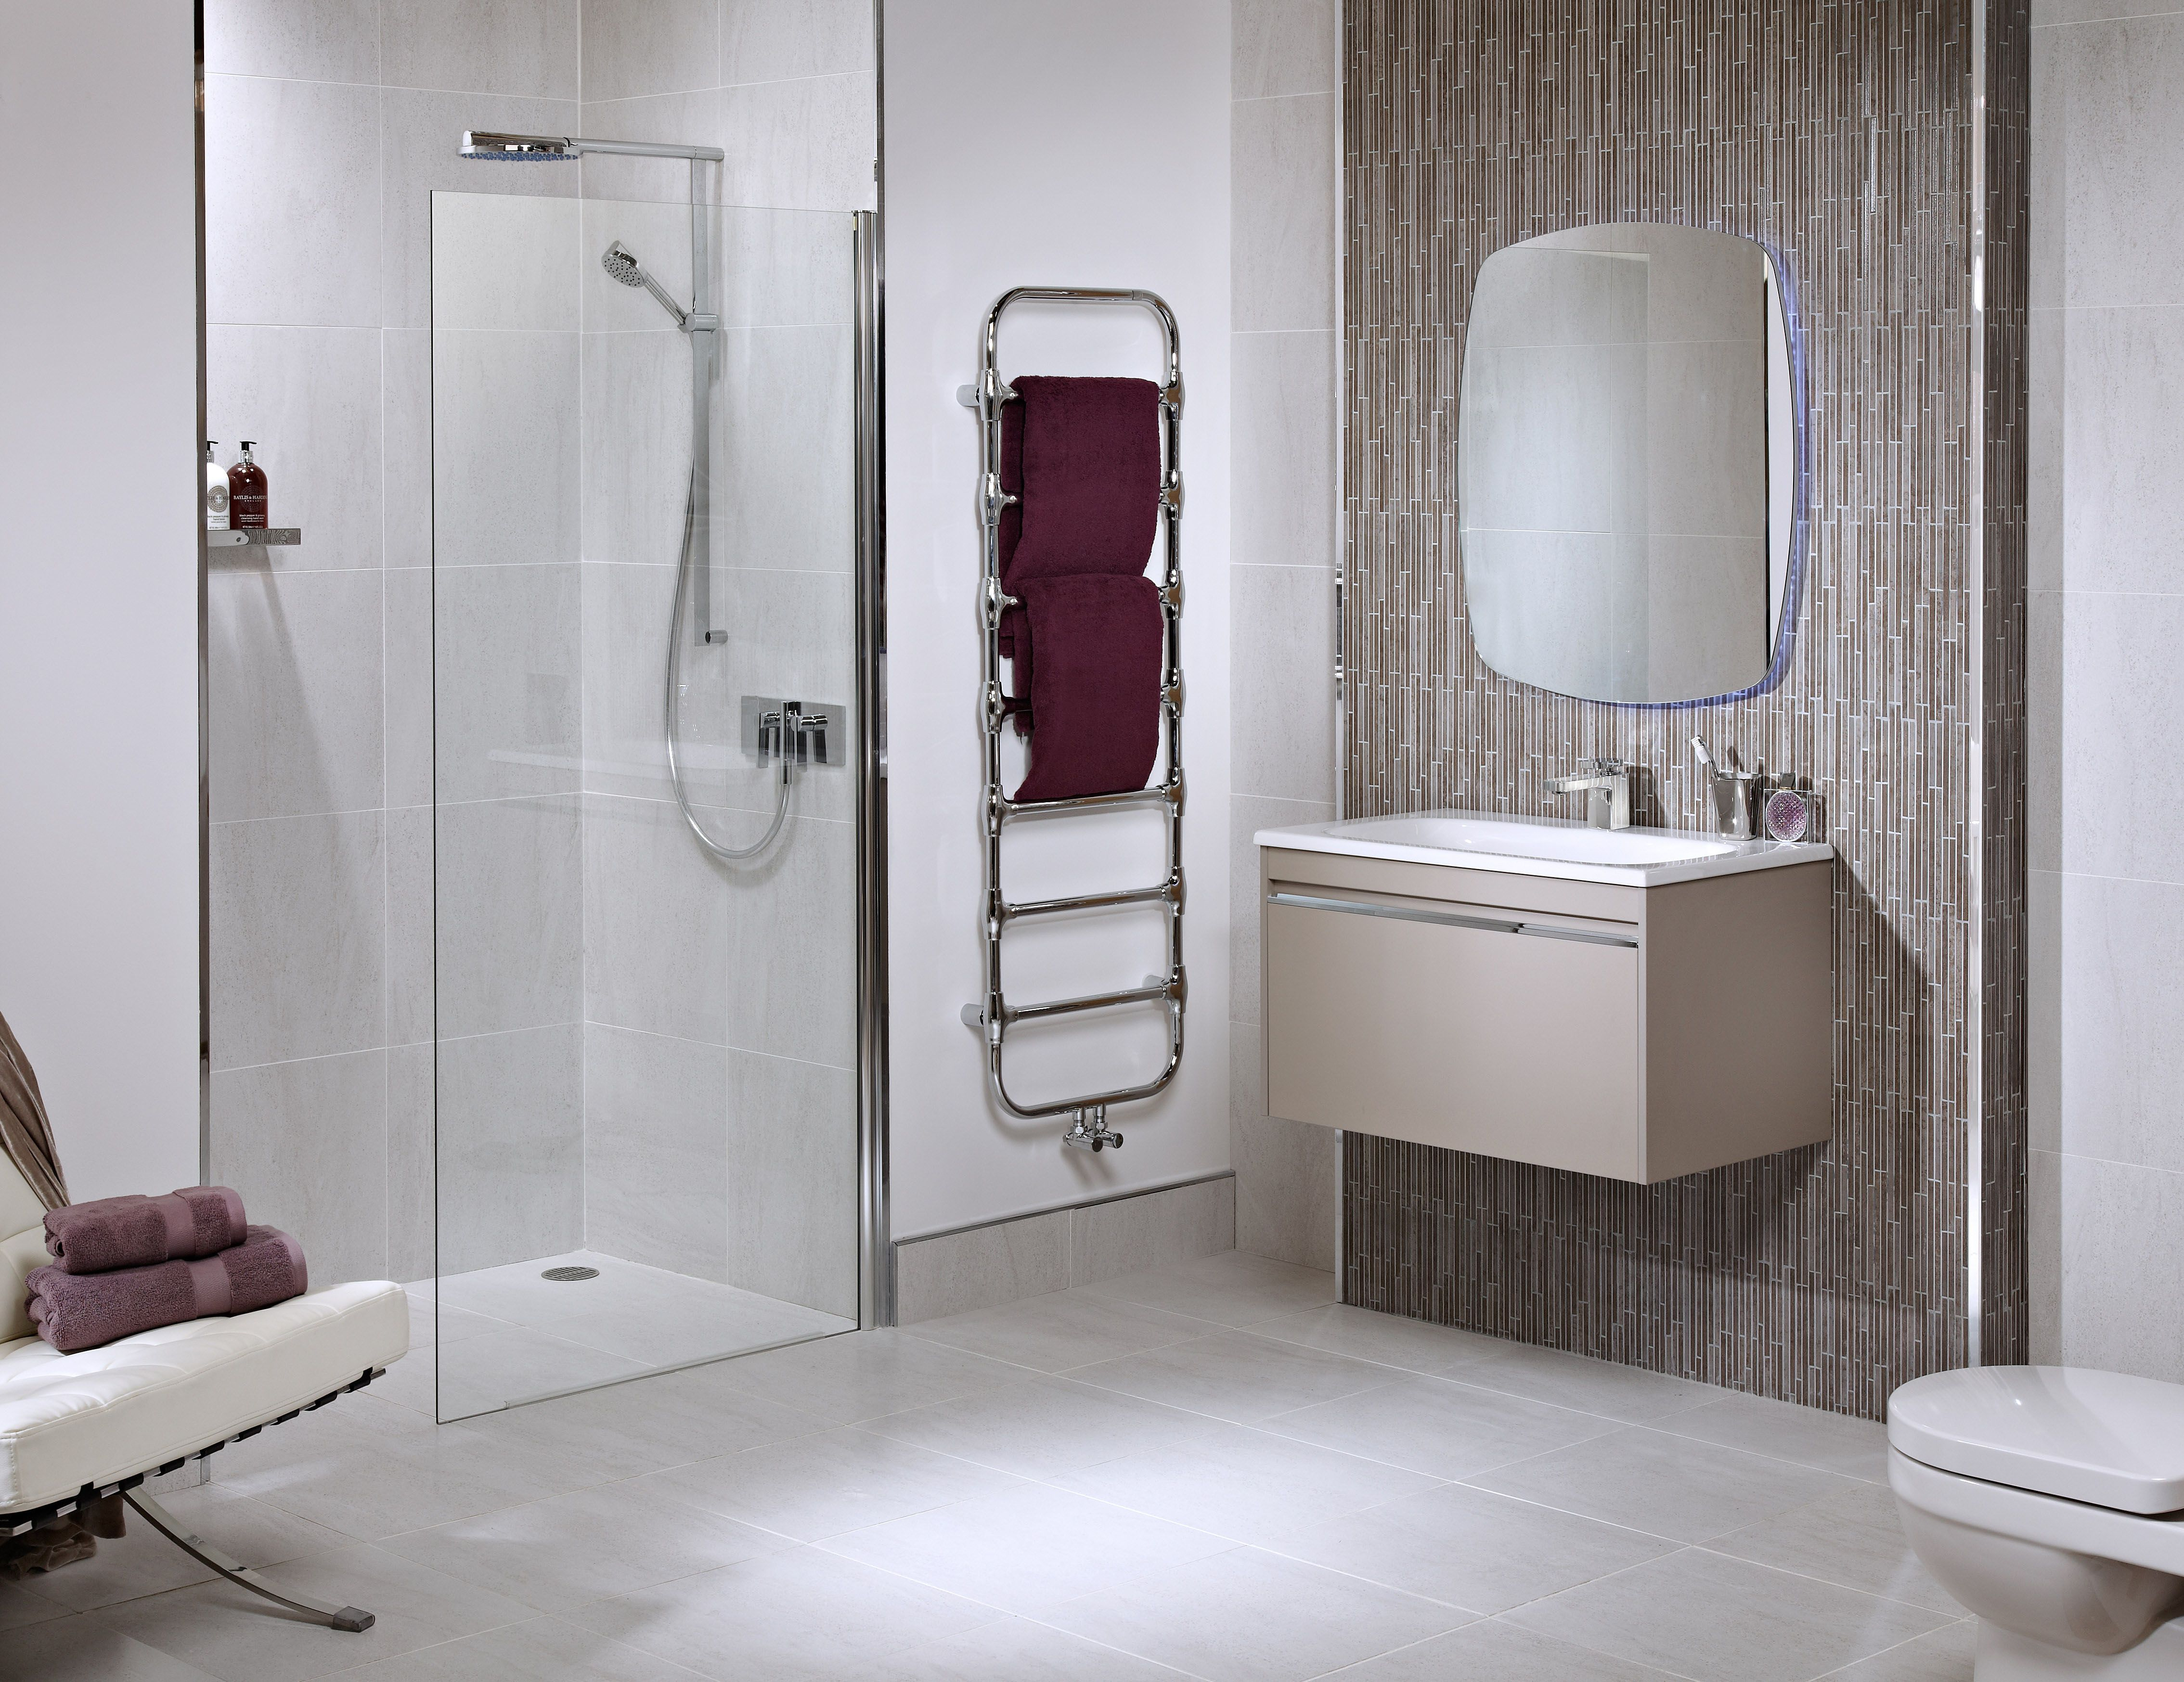 Wet Room Bathroom Wisdom Widadesign Wonder  Home Design Idea Stunning Designer Bathroom Store Decorating Inspiration